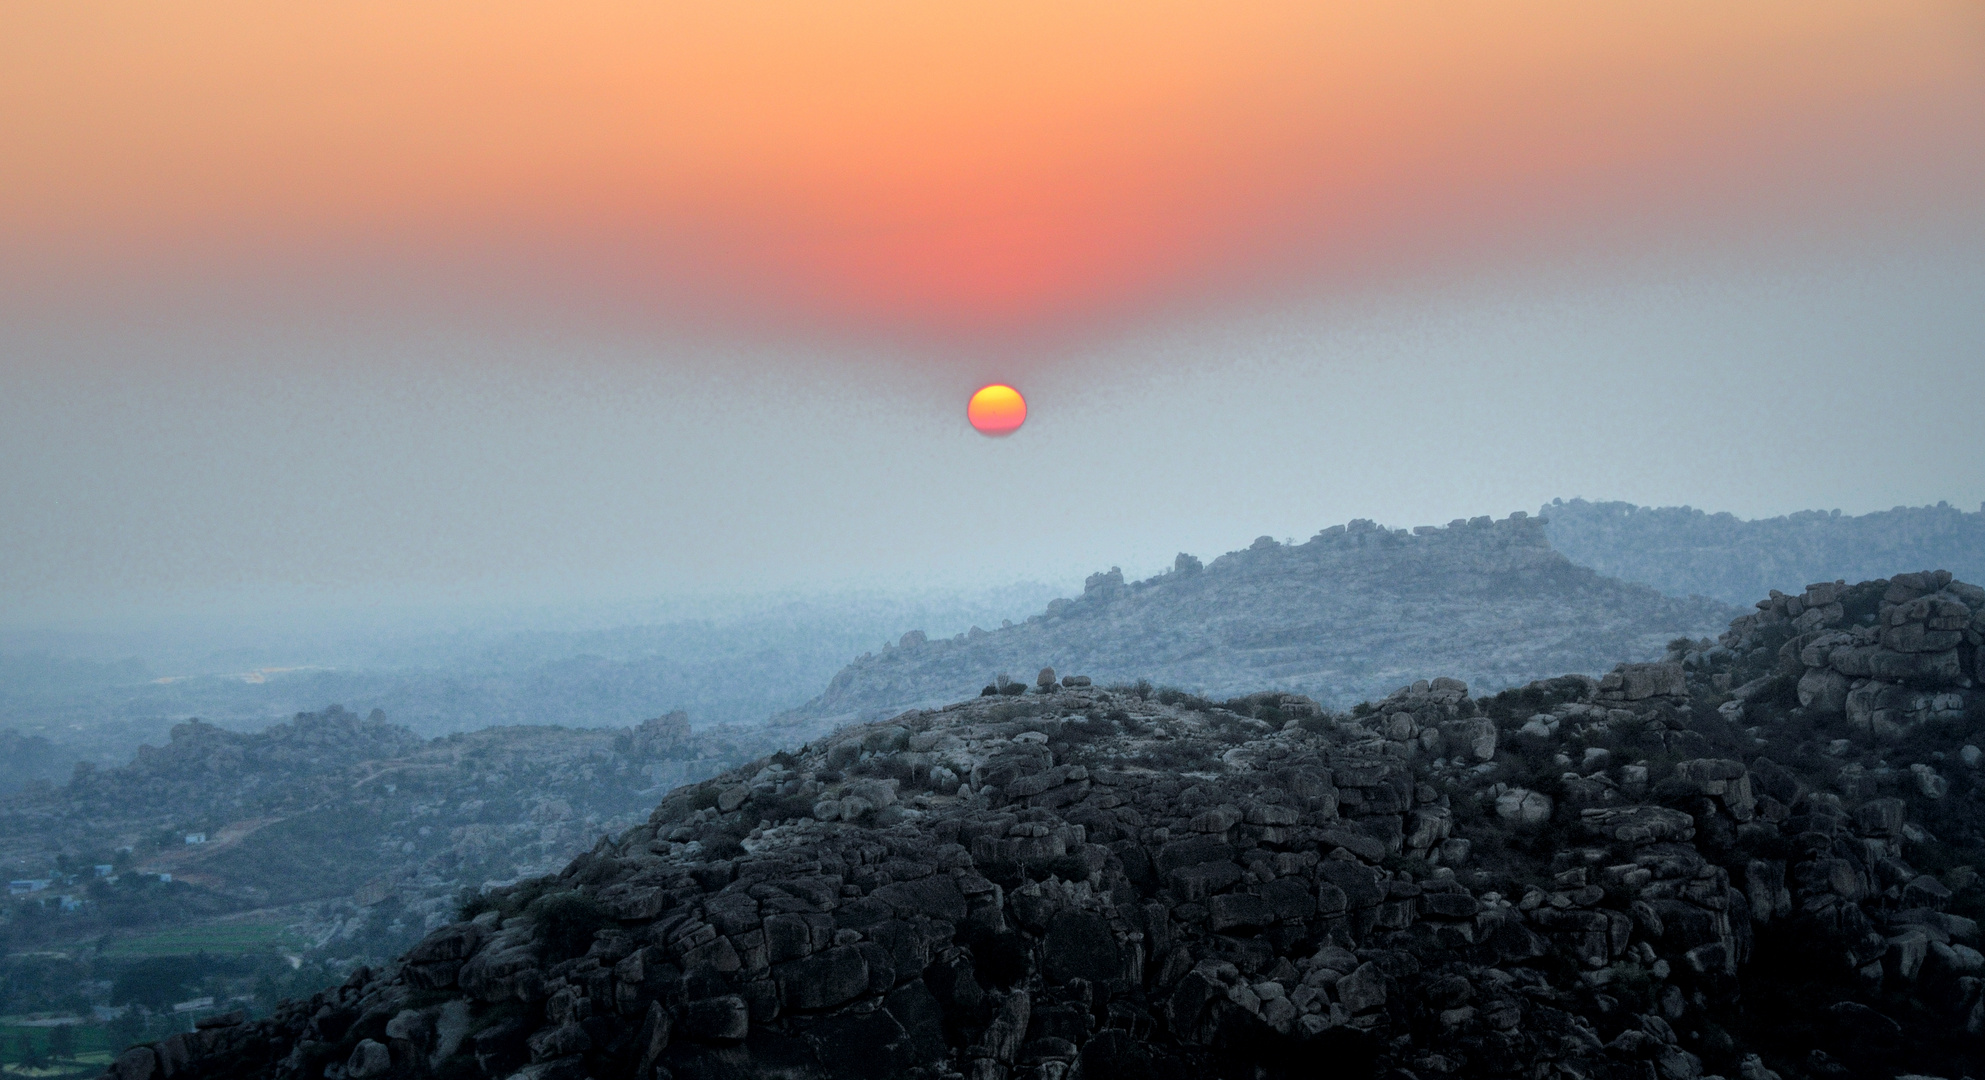 Sunset in Hampi